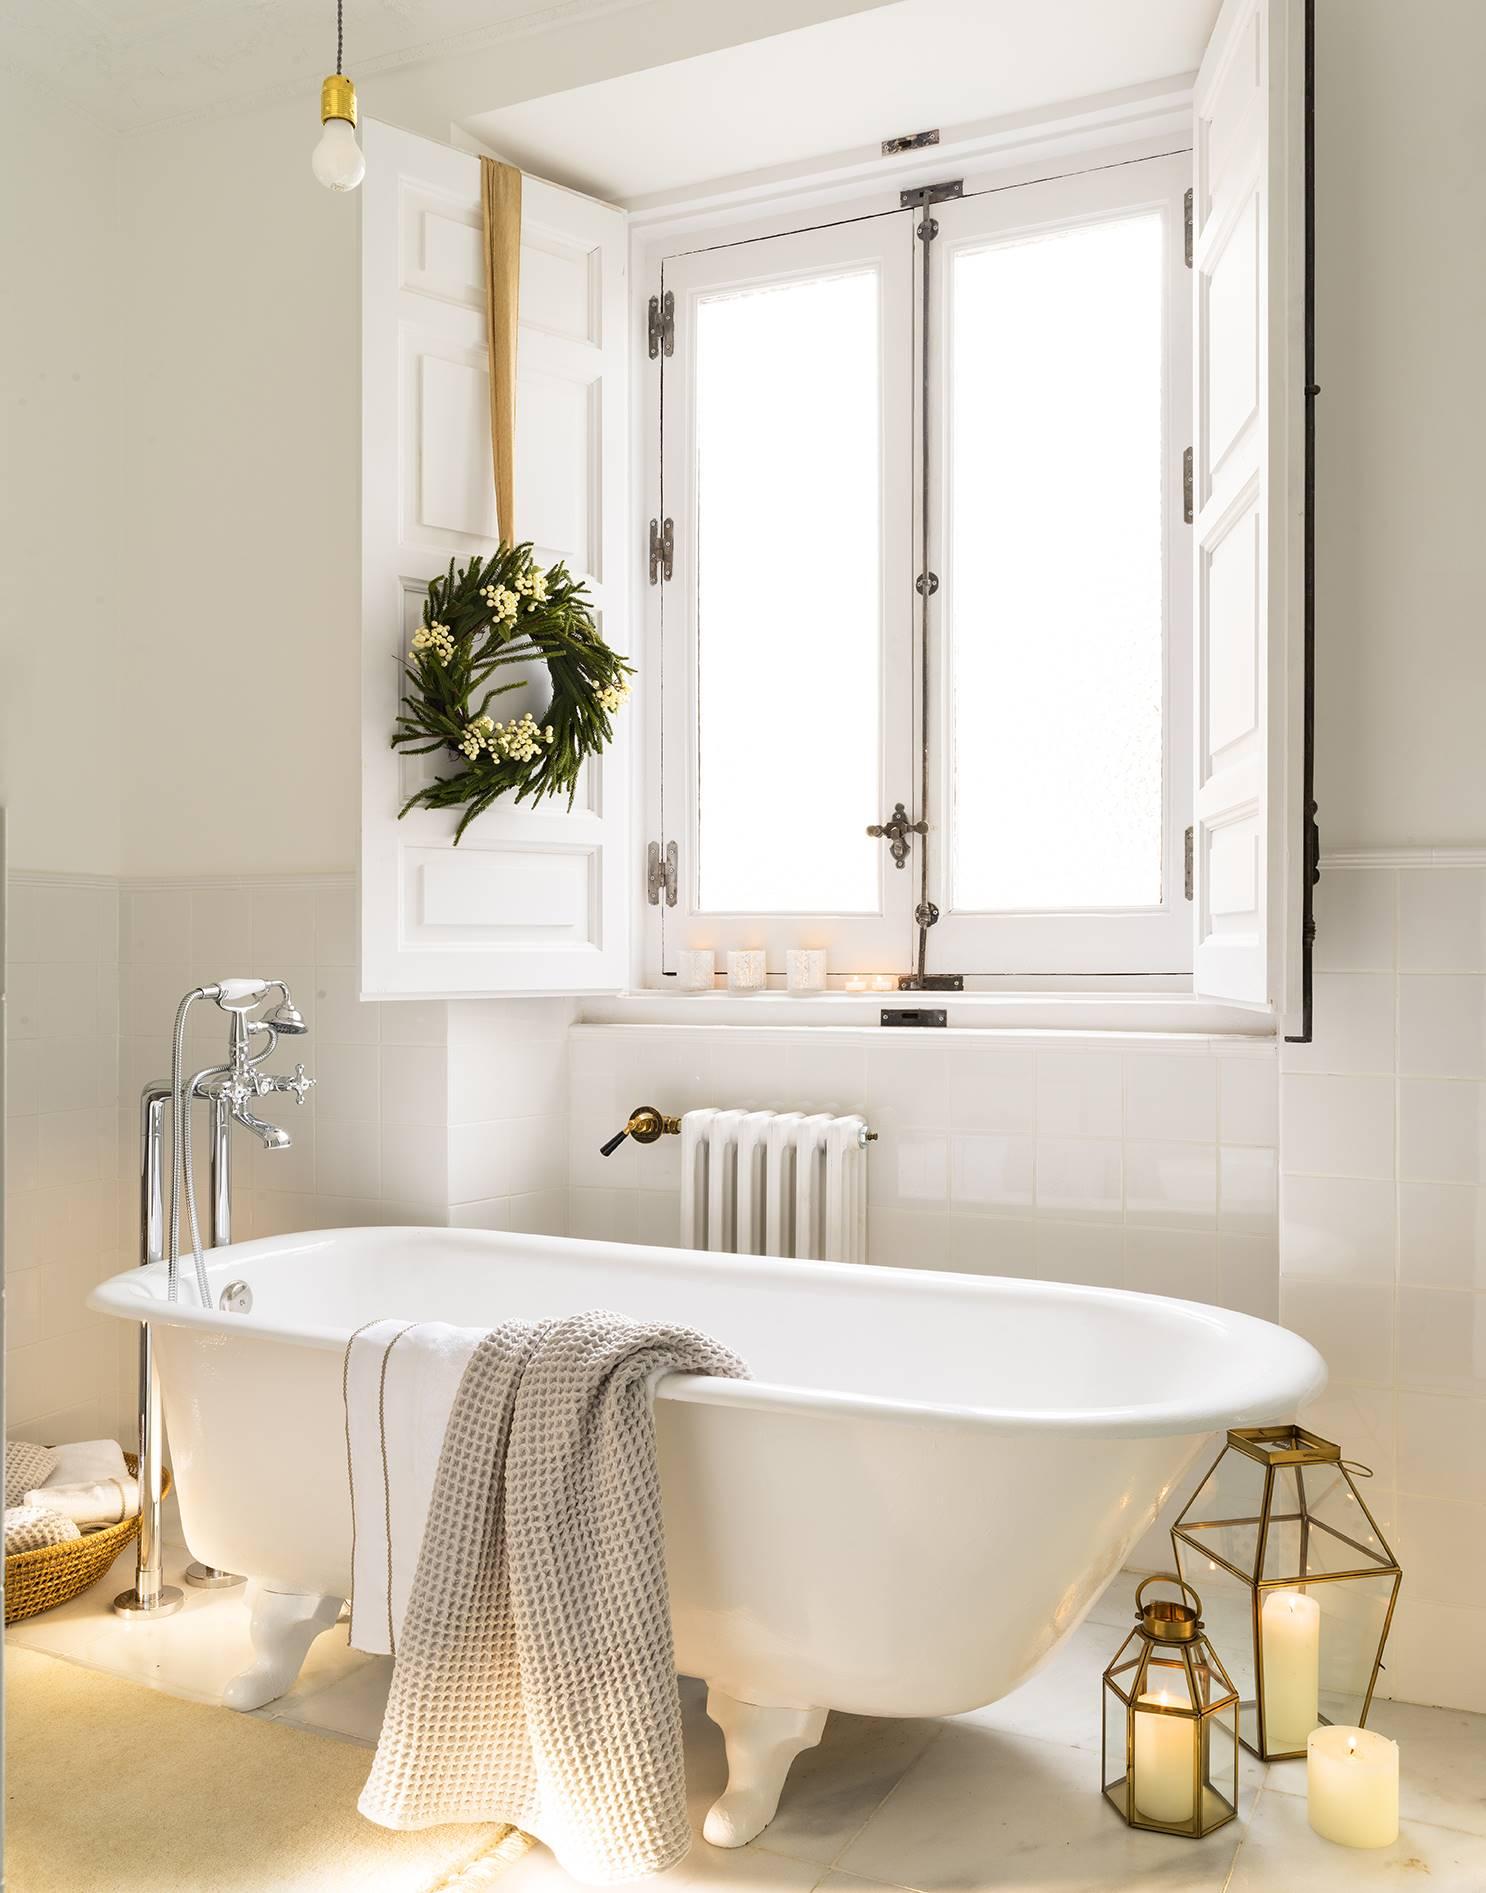 ванная комната с окном ванна на ножках